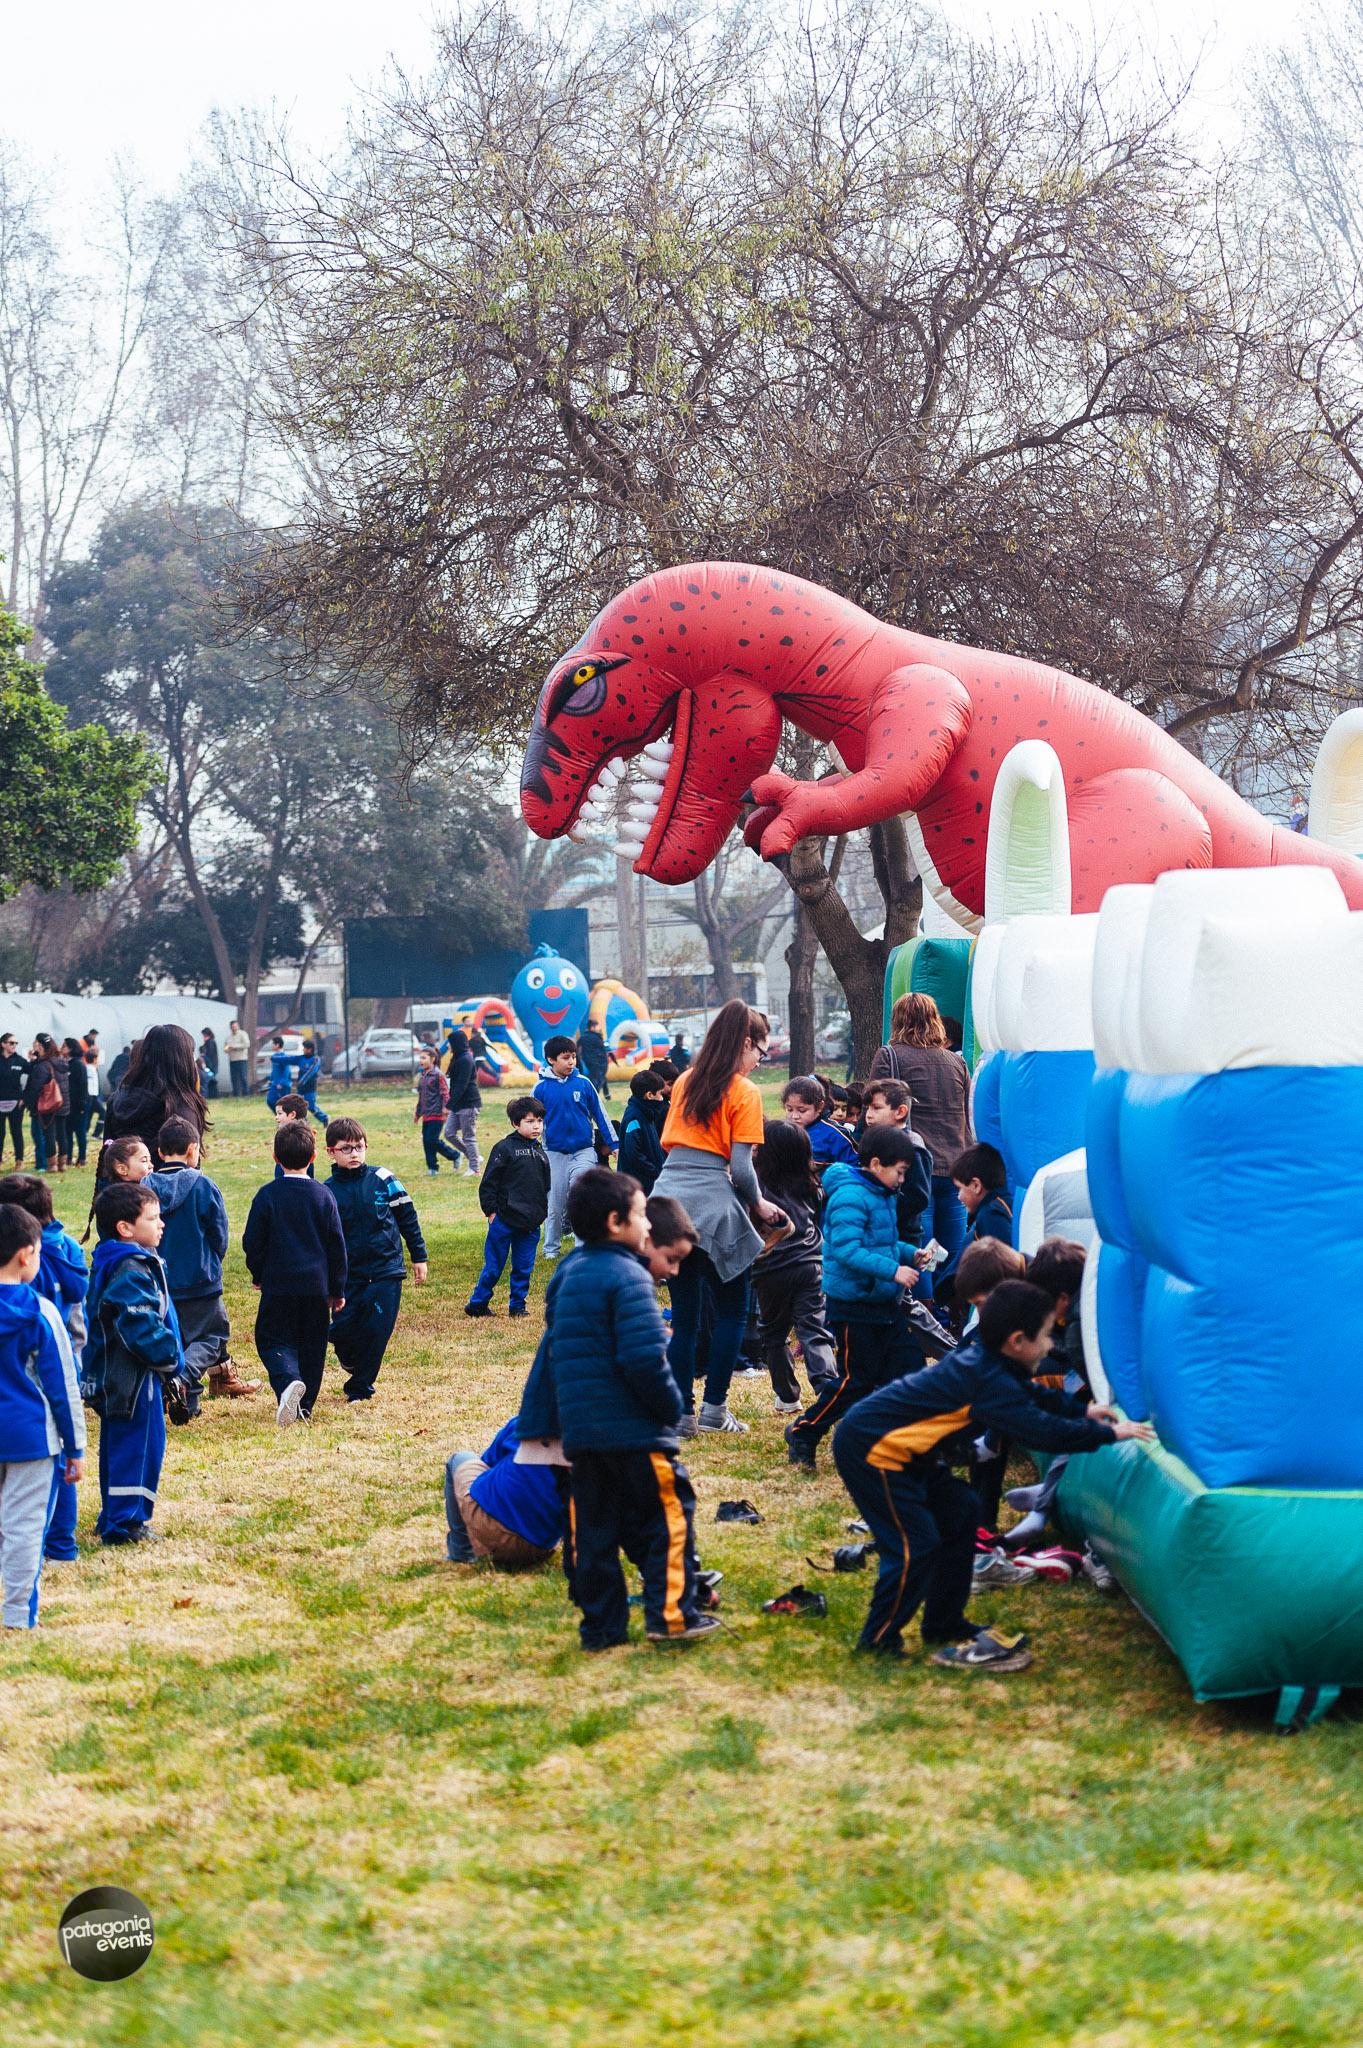 12082016_diadelnino_maipu_patagonia_events_dia_uno_052